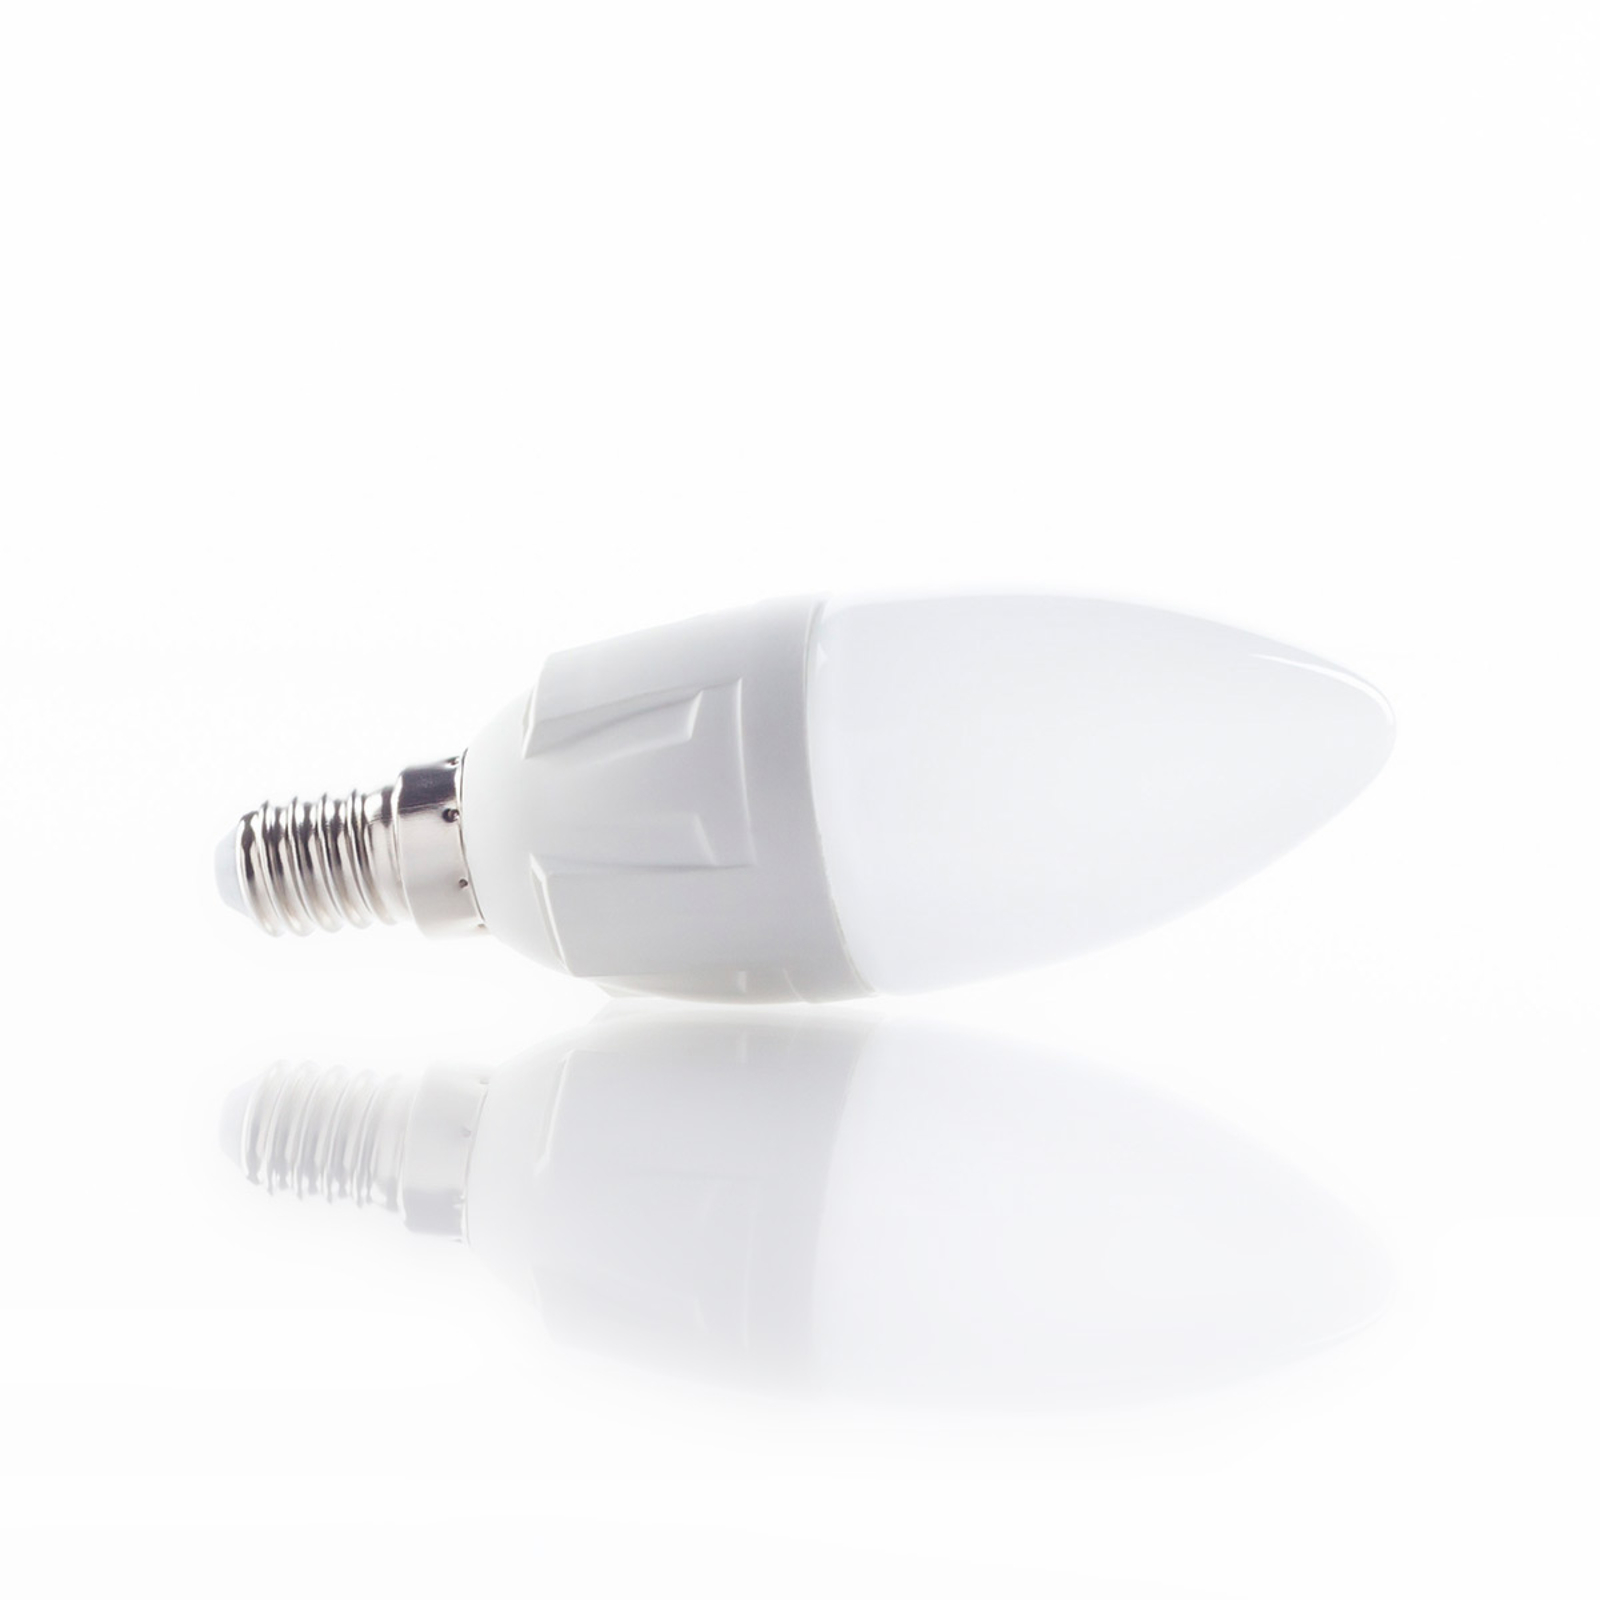 E14 6W 830 candle-shaped LED bulb warm white_9993004_1